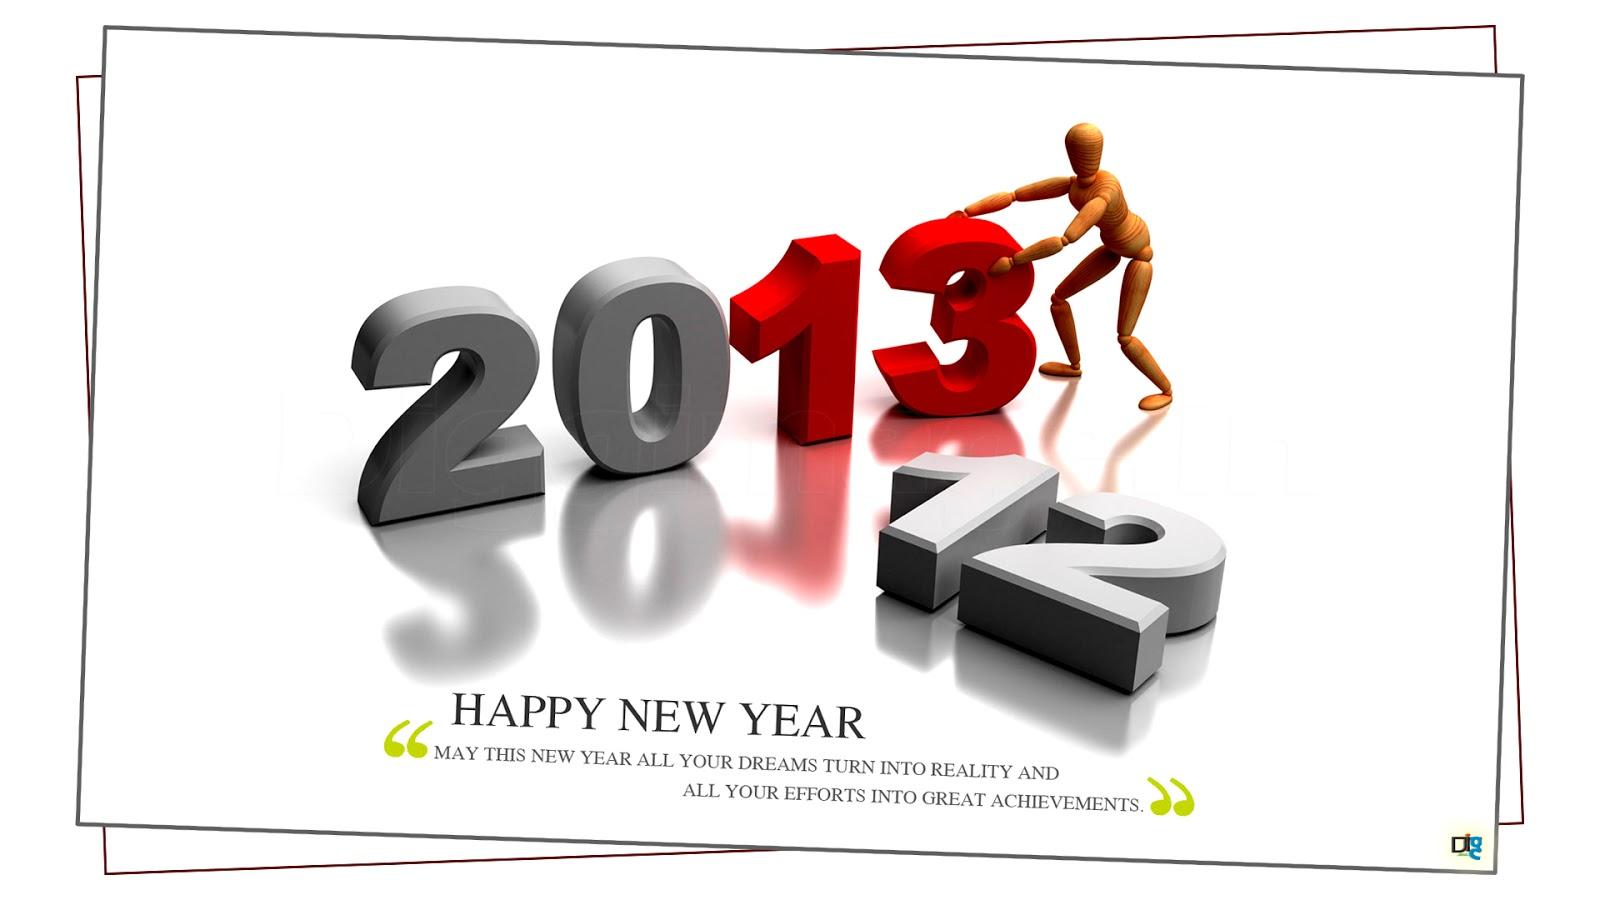 amitava.surosree: hd happy new year 2013 wallpaper - vol - 5